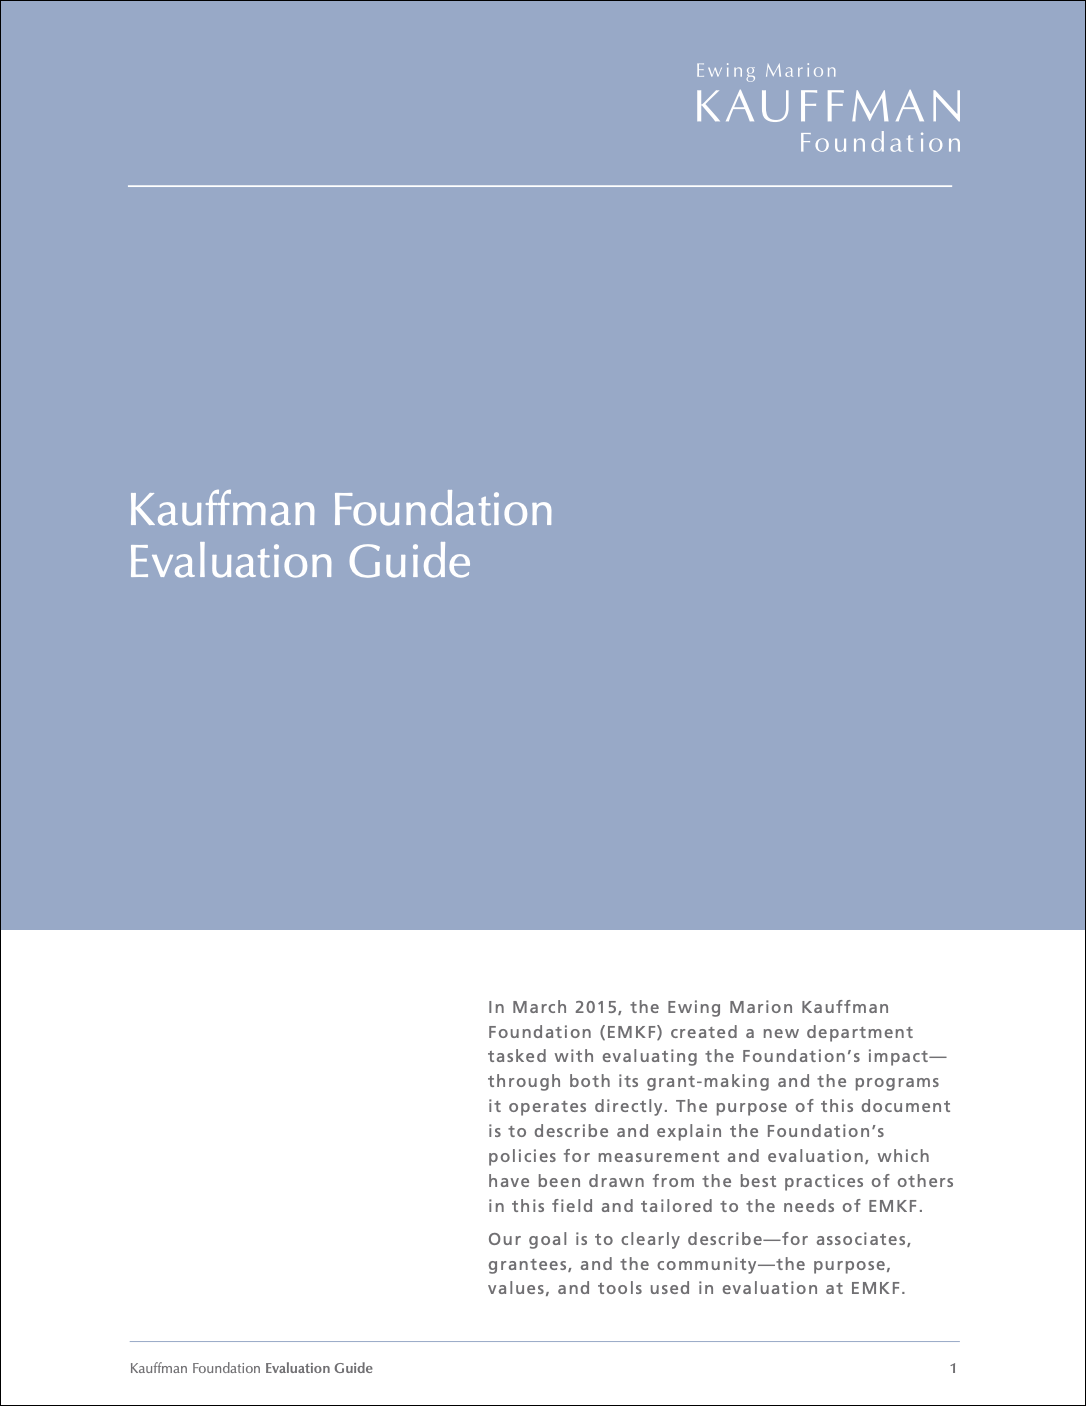 Kauffman Foundation Evaluation Guide